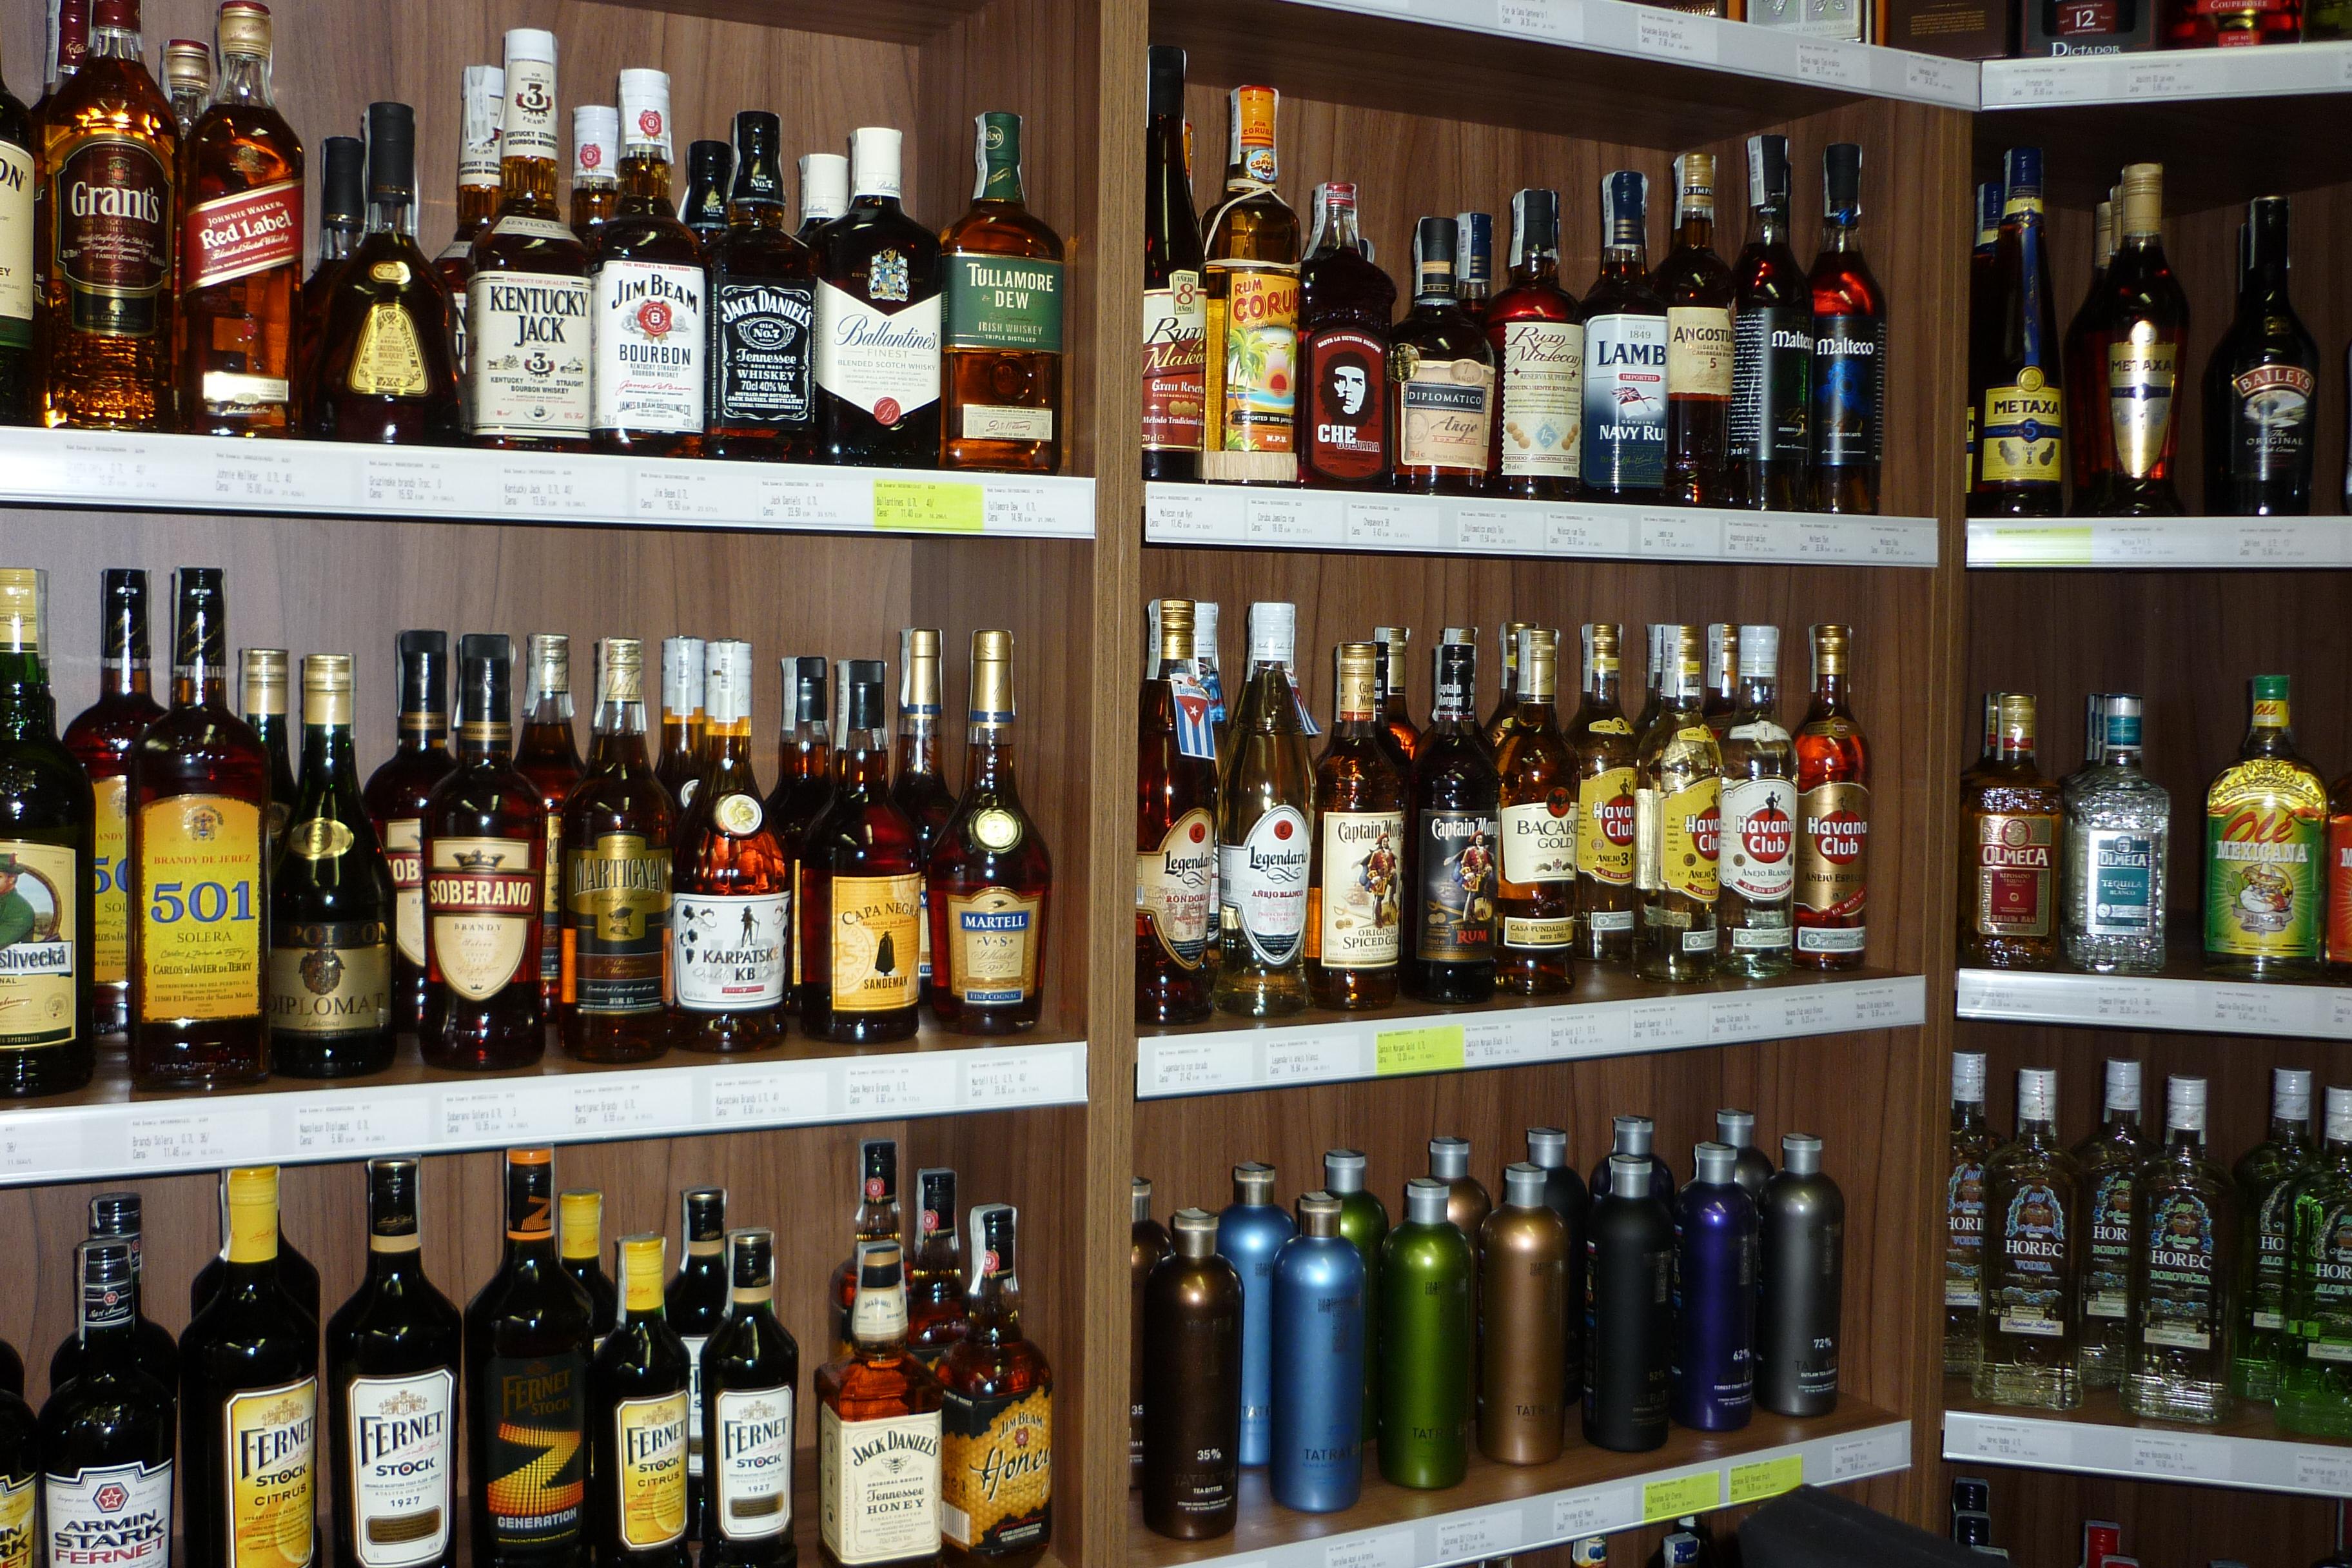 Predaj destilátov Liquor shop Nitra - Katalóg firiem  16935b883ec